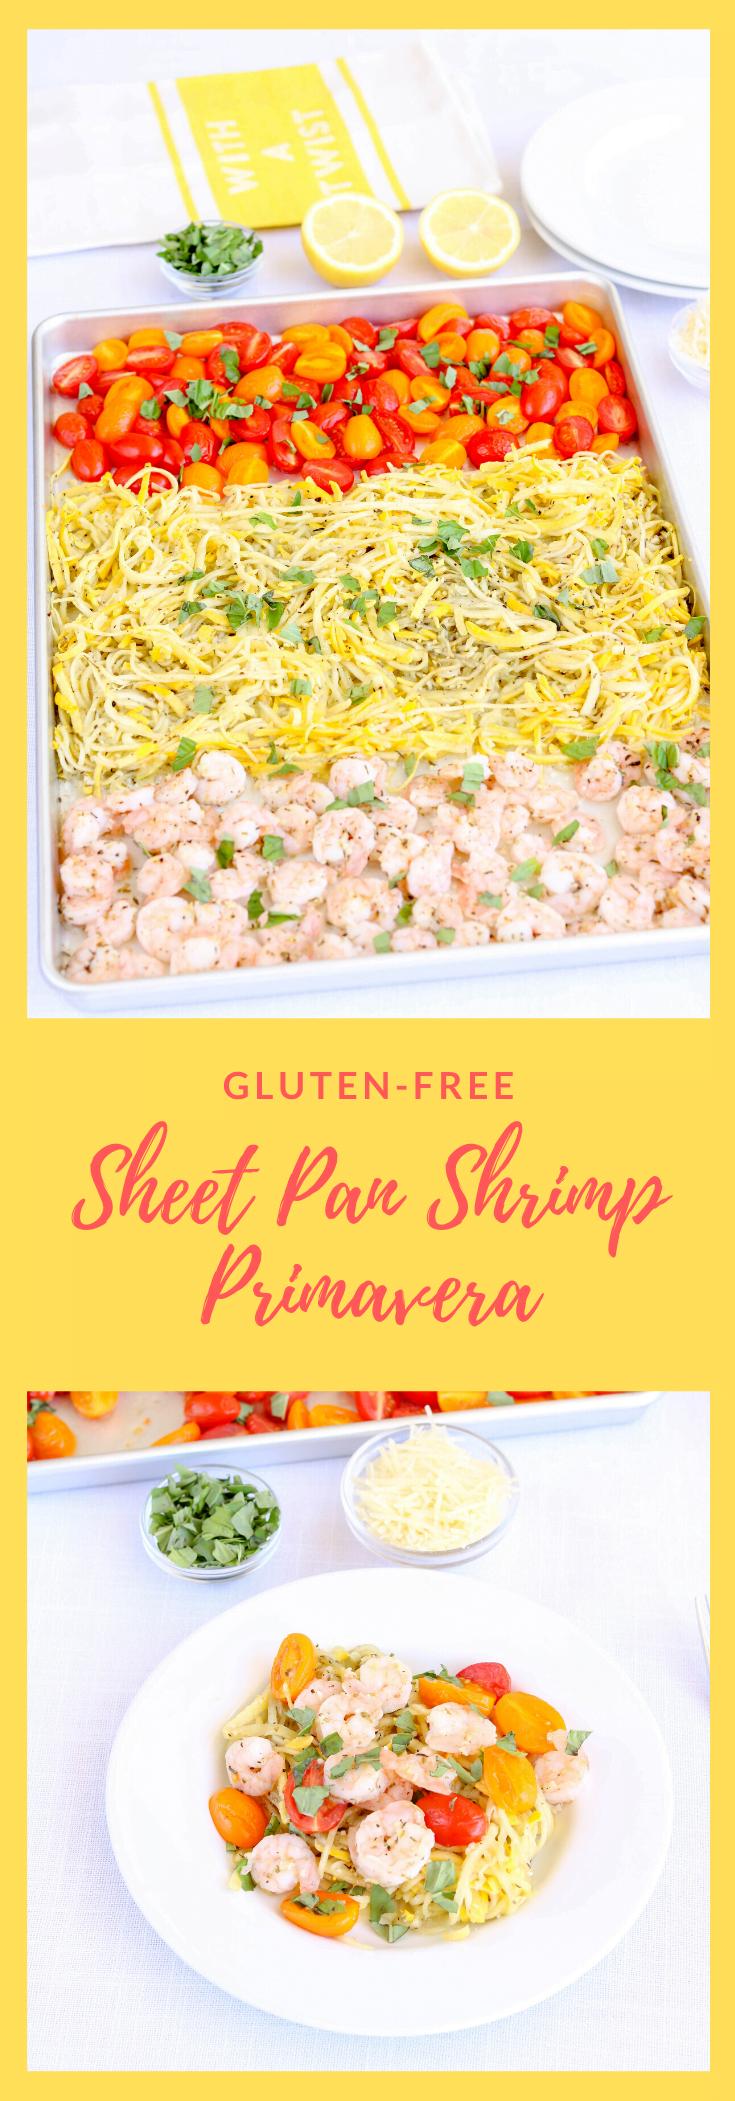 sheet-pan-shrimp-primavera-recipe